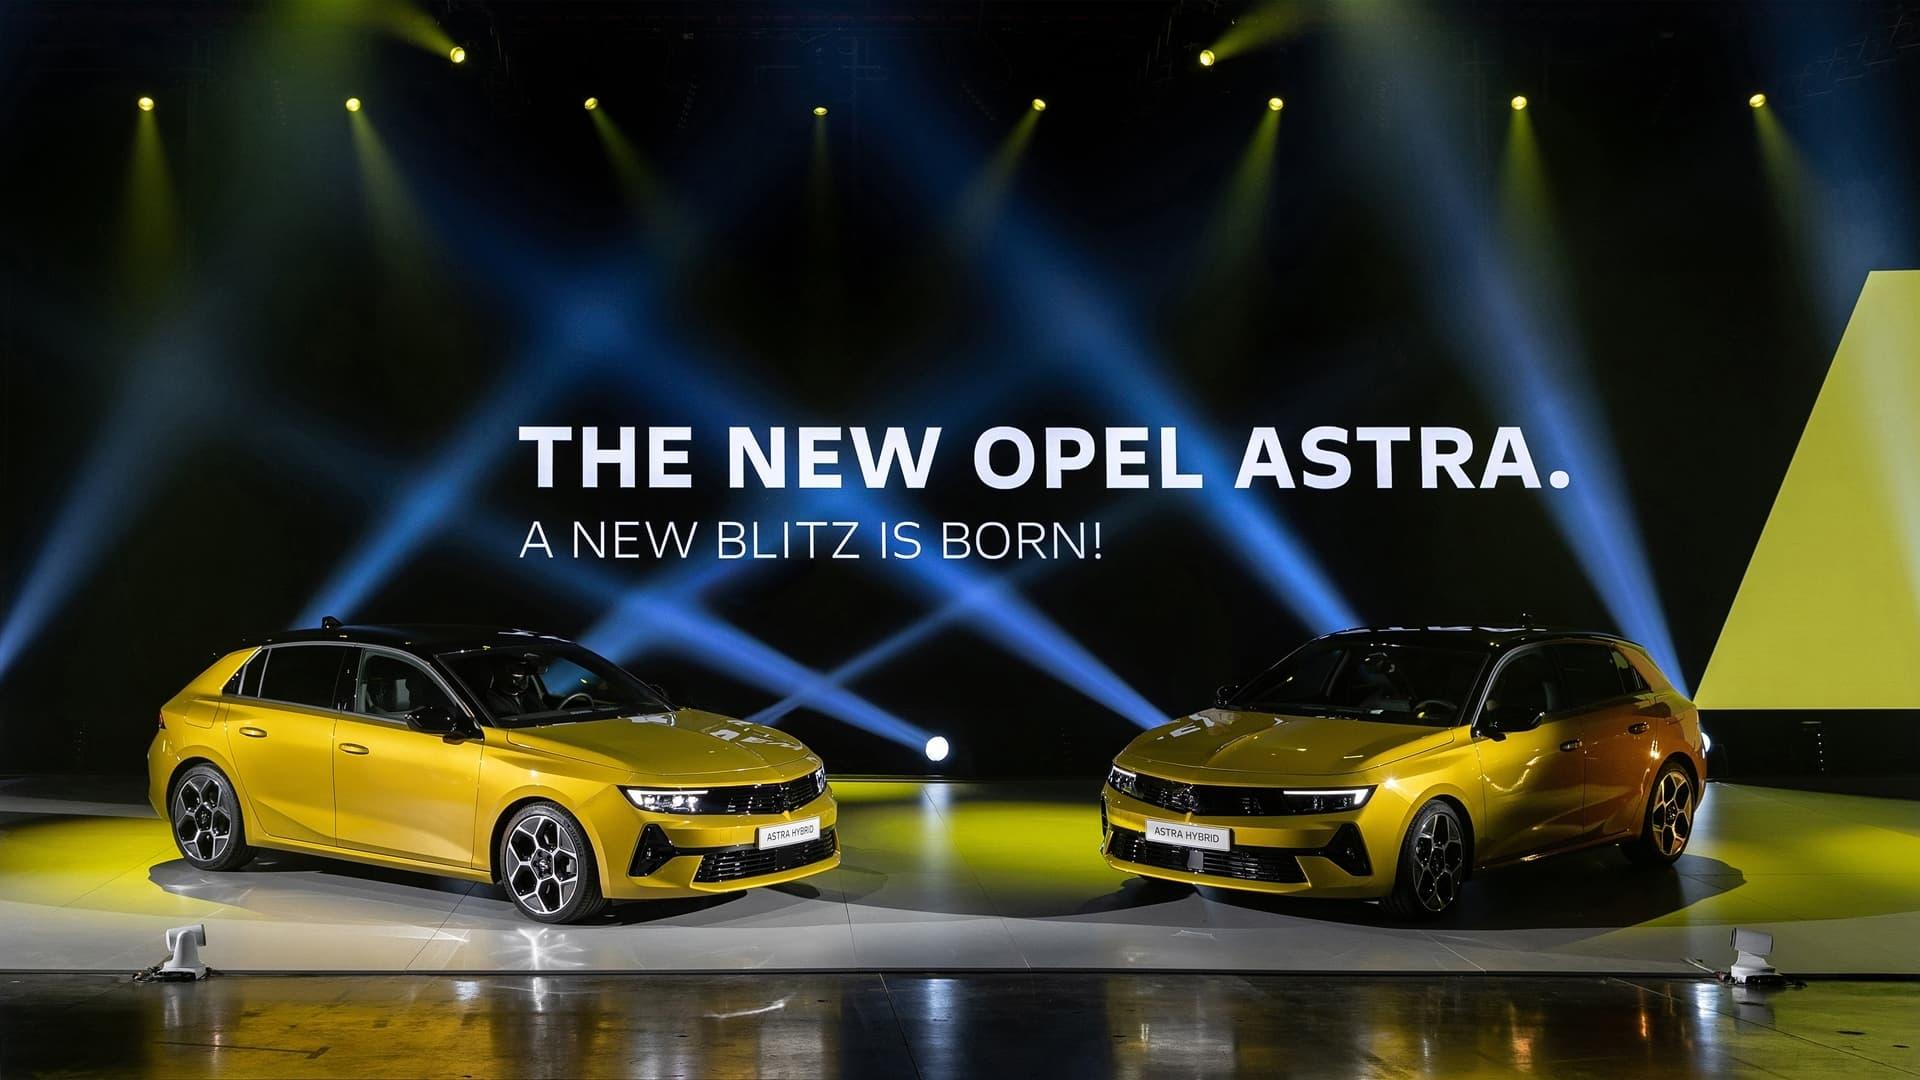 Opel Astra 2022 0921 002